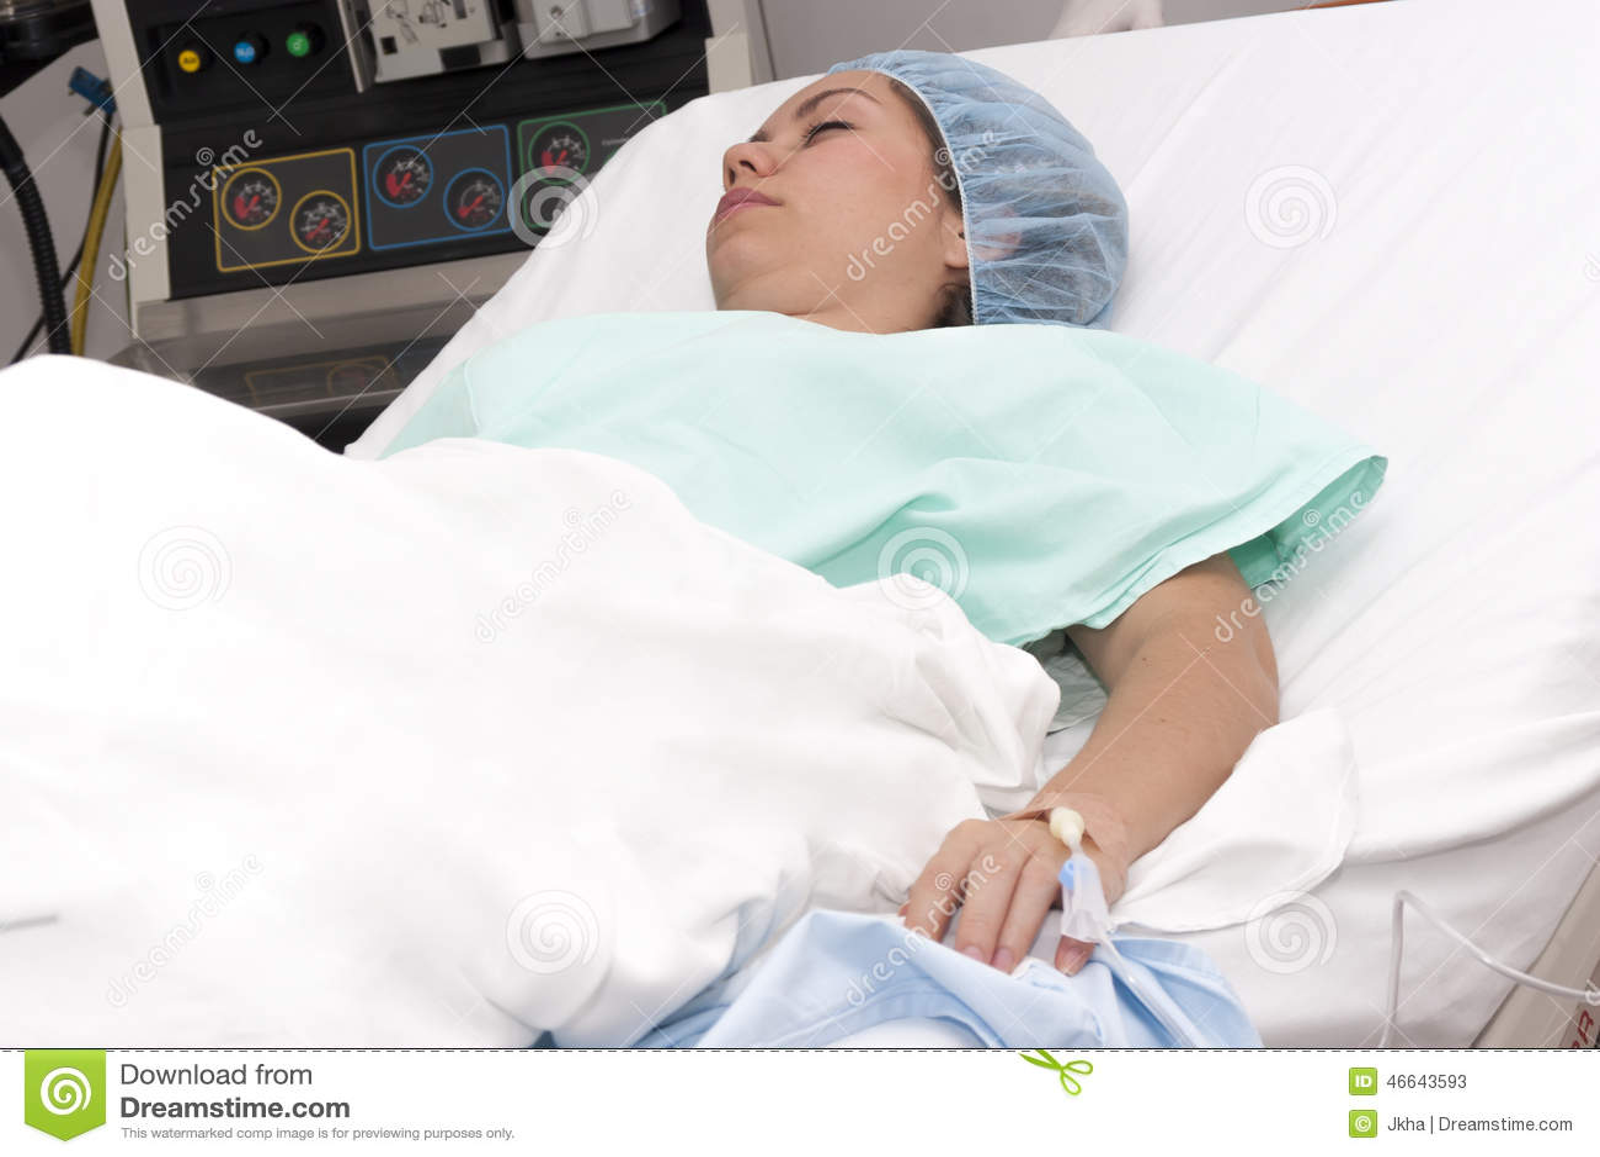 Black Woman Lying In Hospital Bed